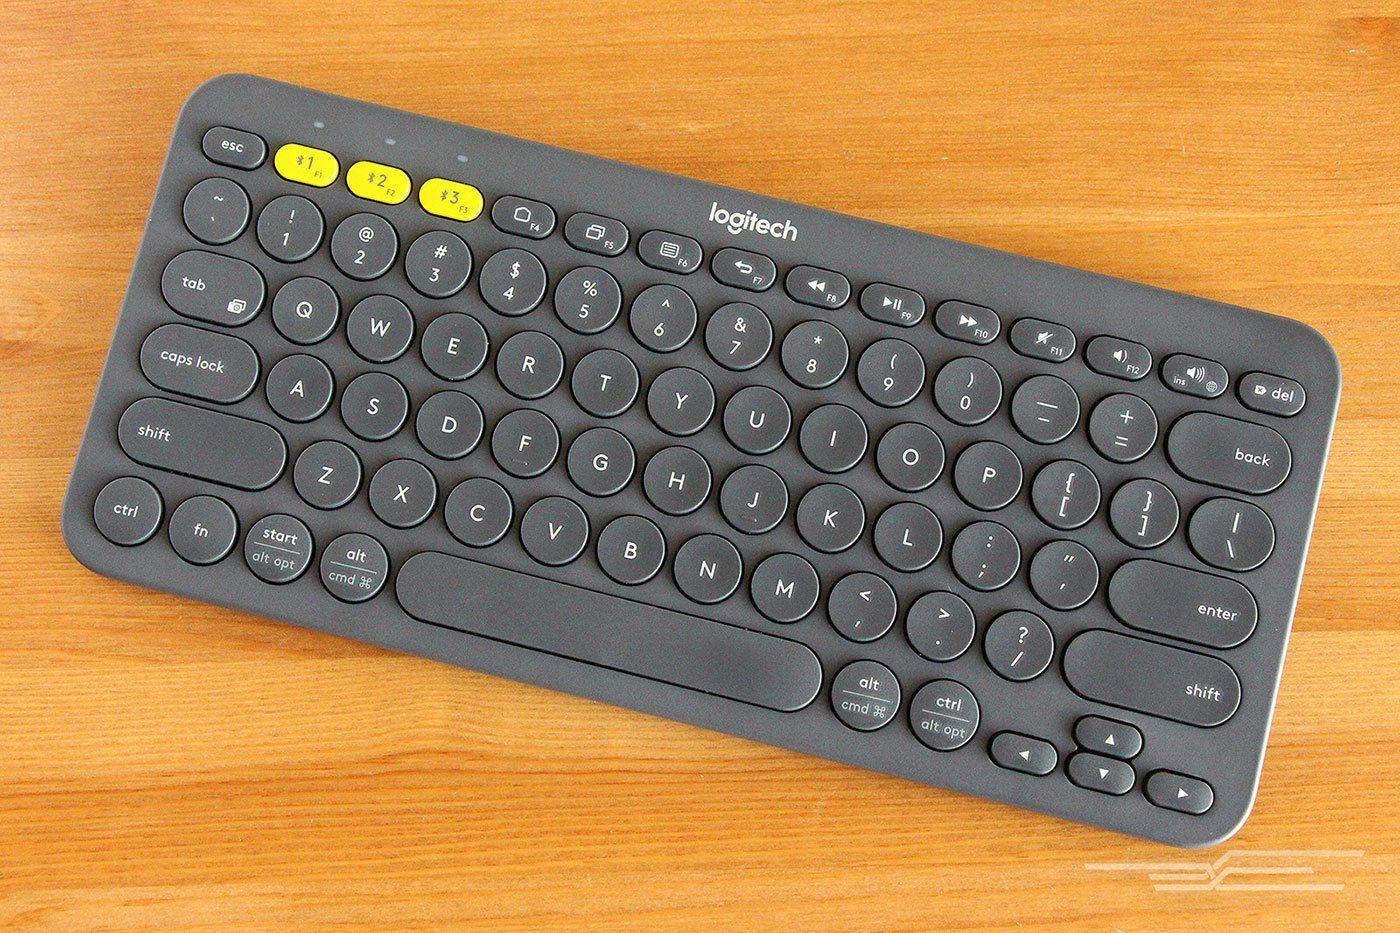 The best bluetooth keyboard - http://www.sogotechnews.com/2017/01/27/the-best-bluetooth-keyboard-2/?utm_source=Pinterest&utm_medium=autoshare&utm_campaign=SOGO+Tech+News